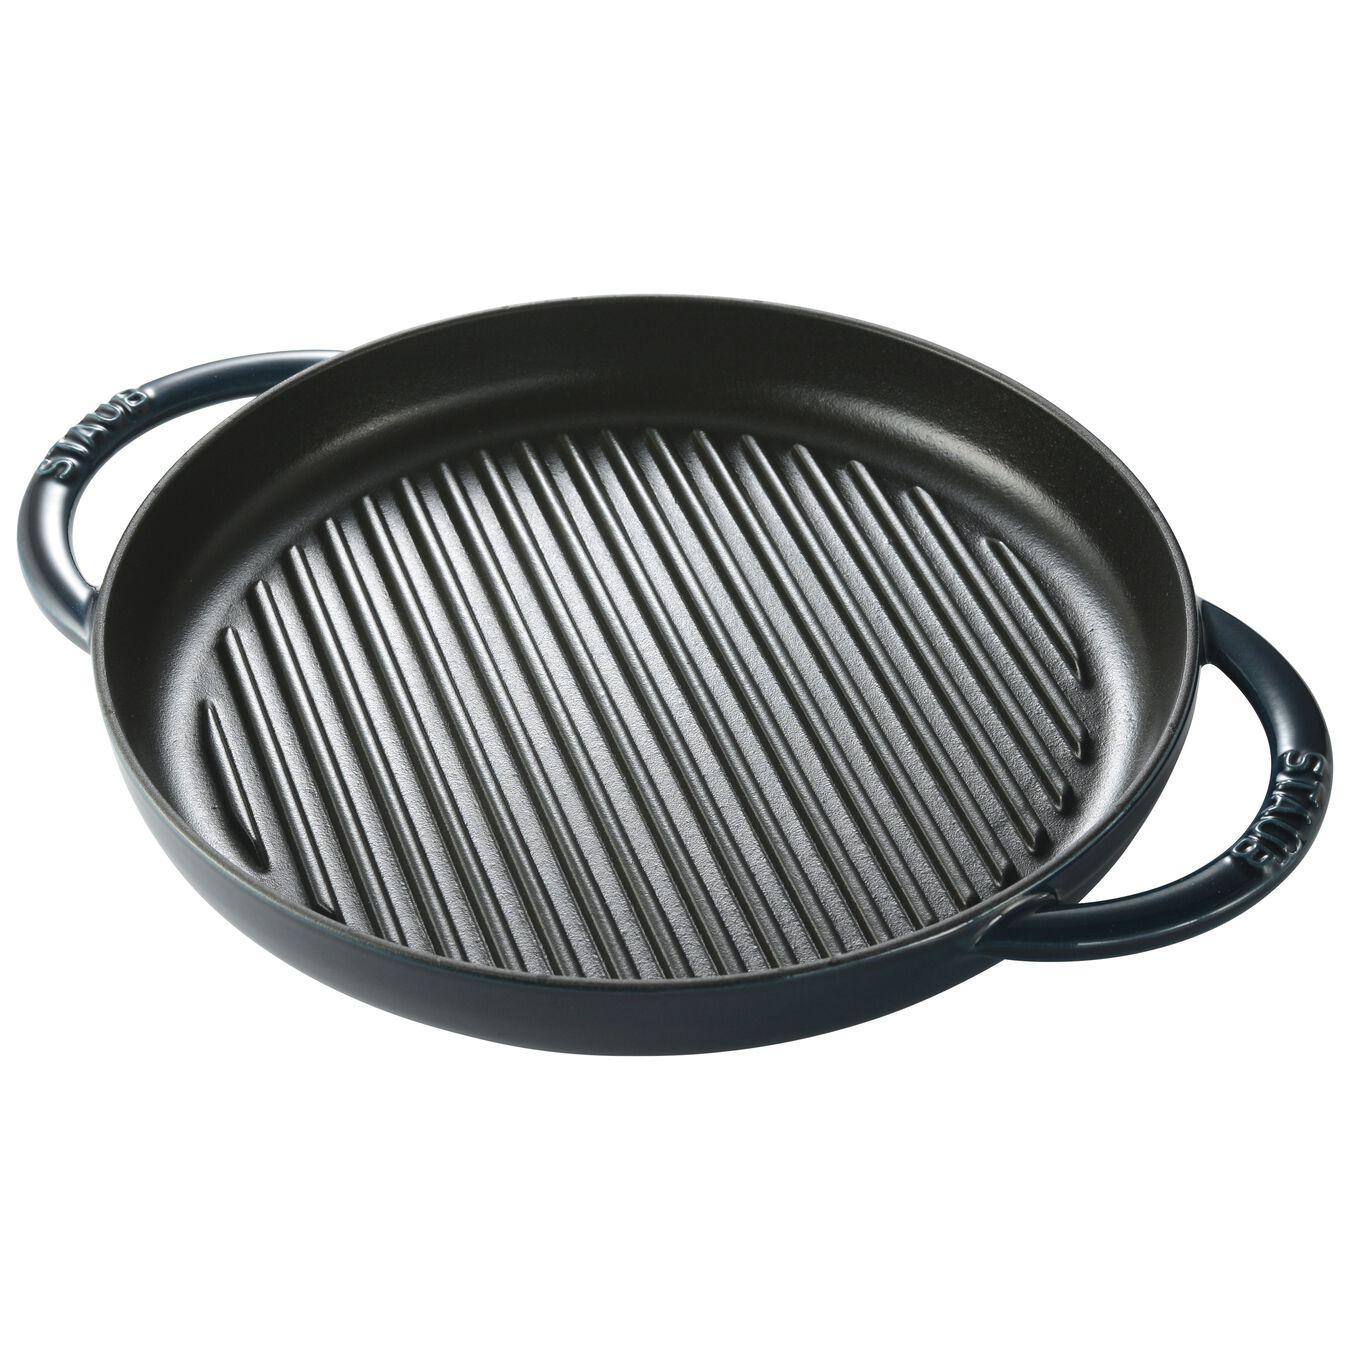 26 cm round Pure Grill, la-mer,,large 2